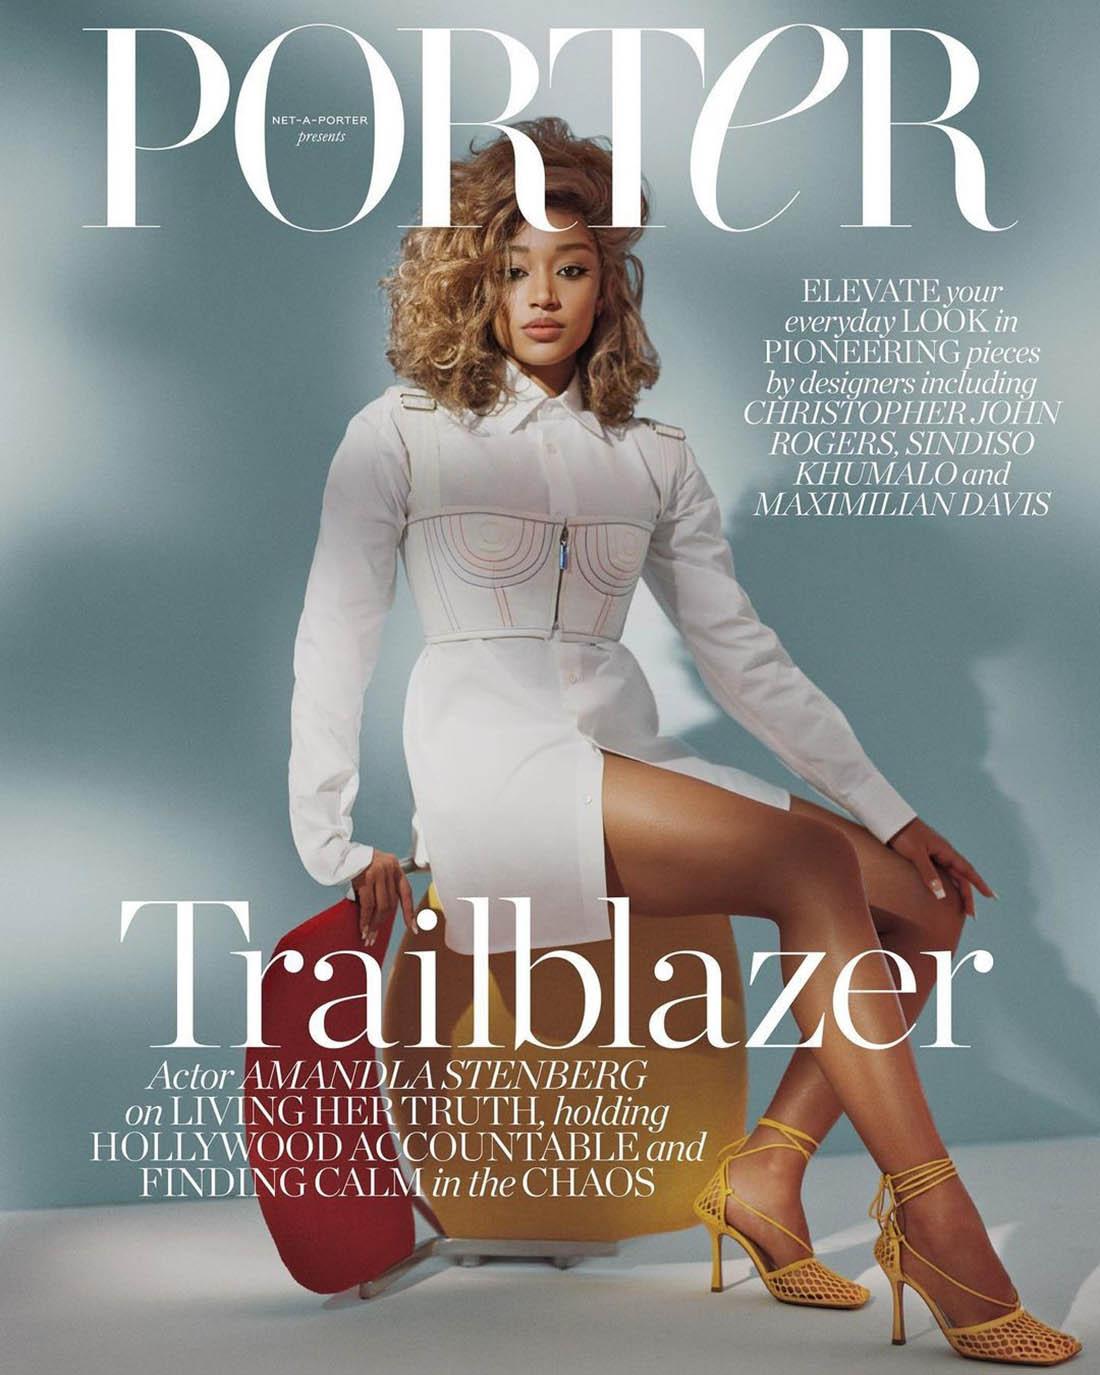 Amandla Stenberg covers Porter Magazine February 8th, 2021 by Miranda Barnes